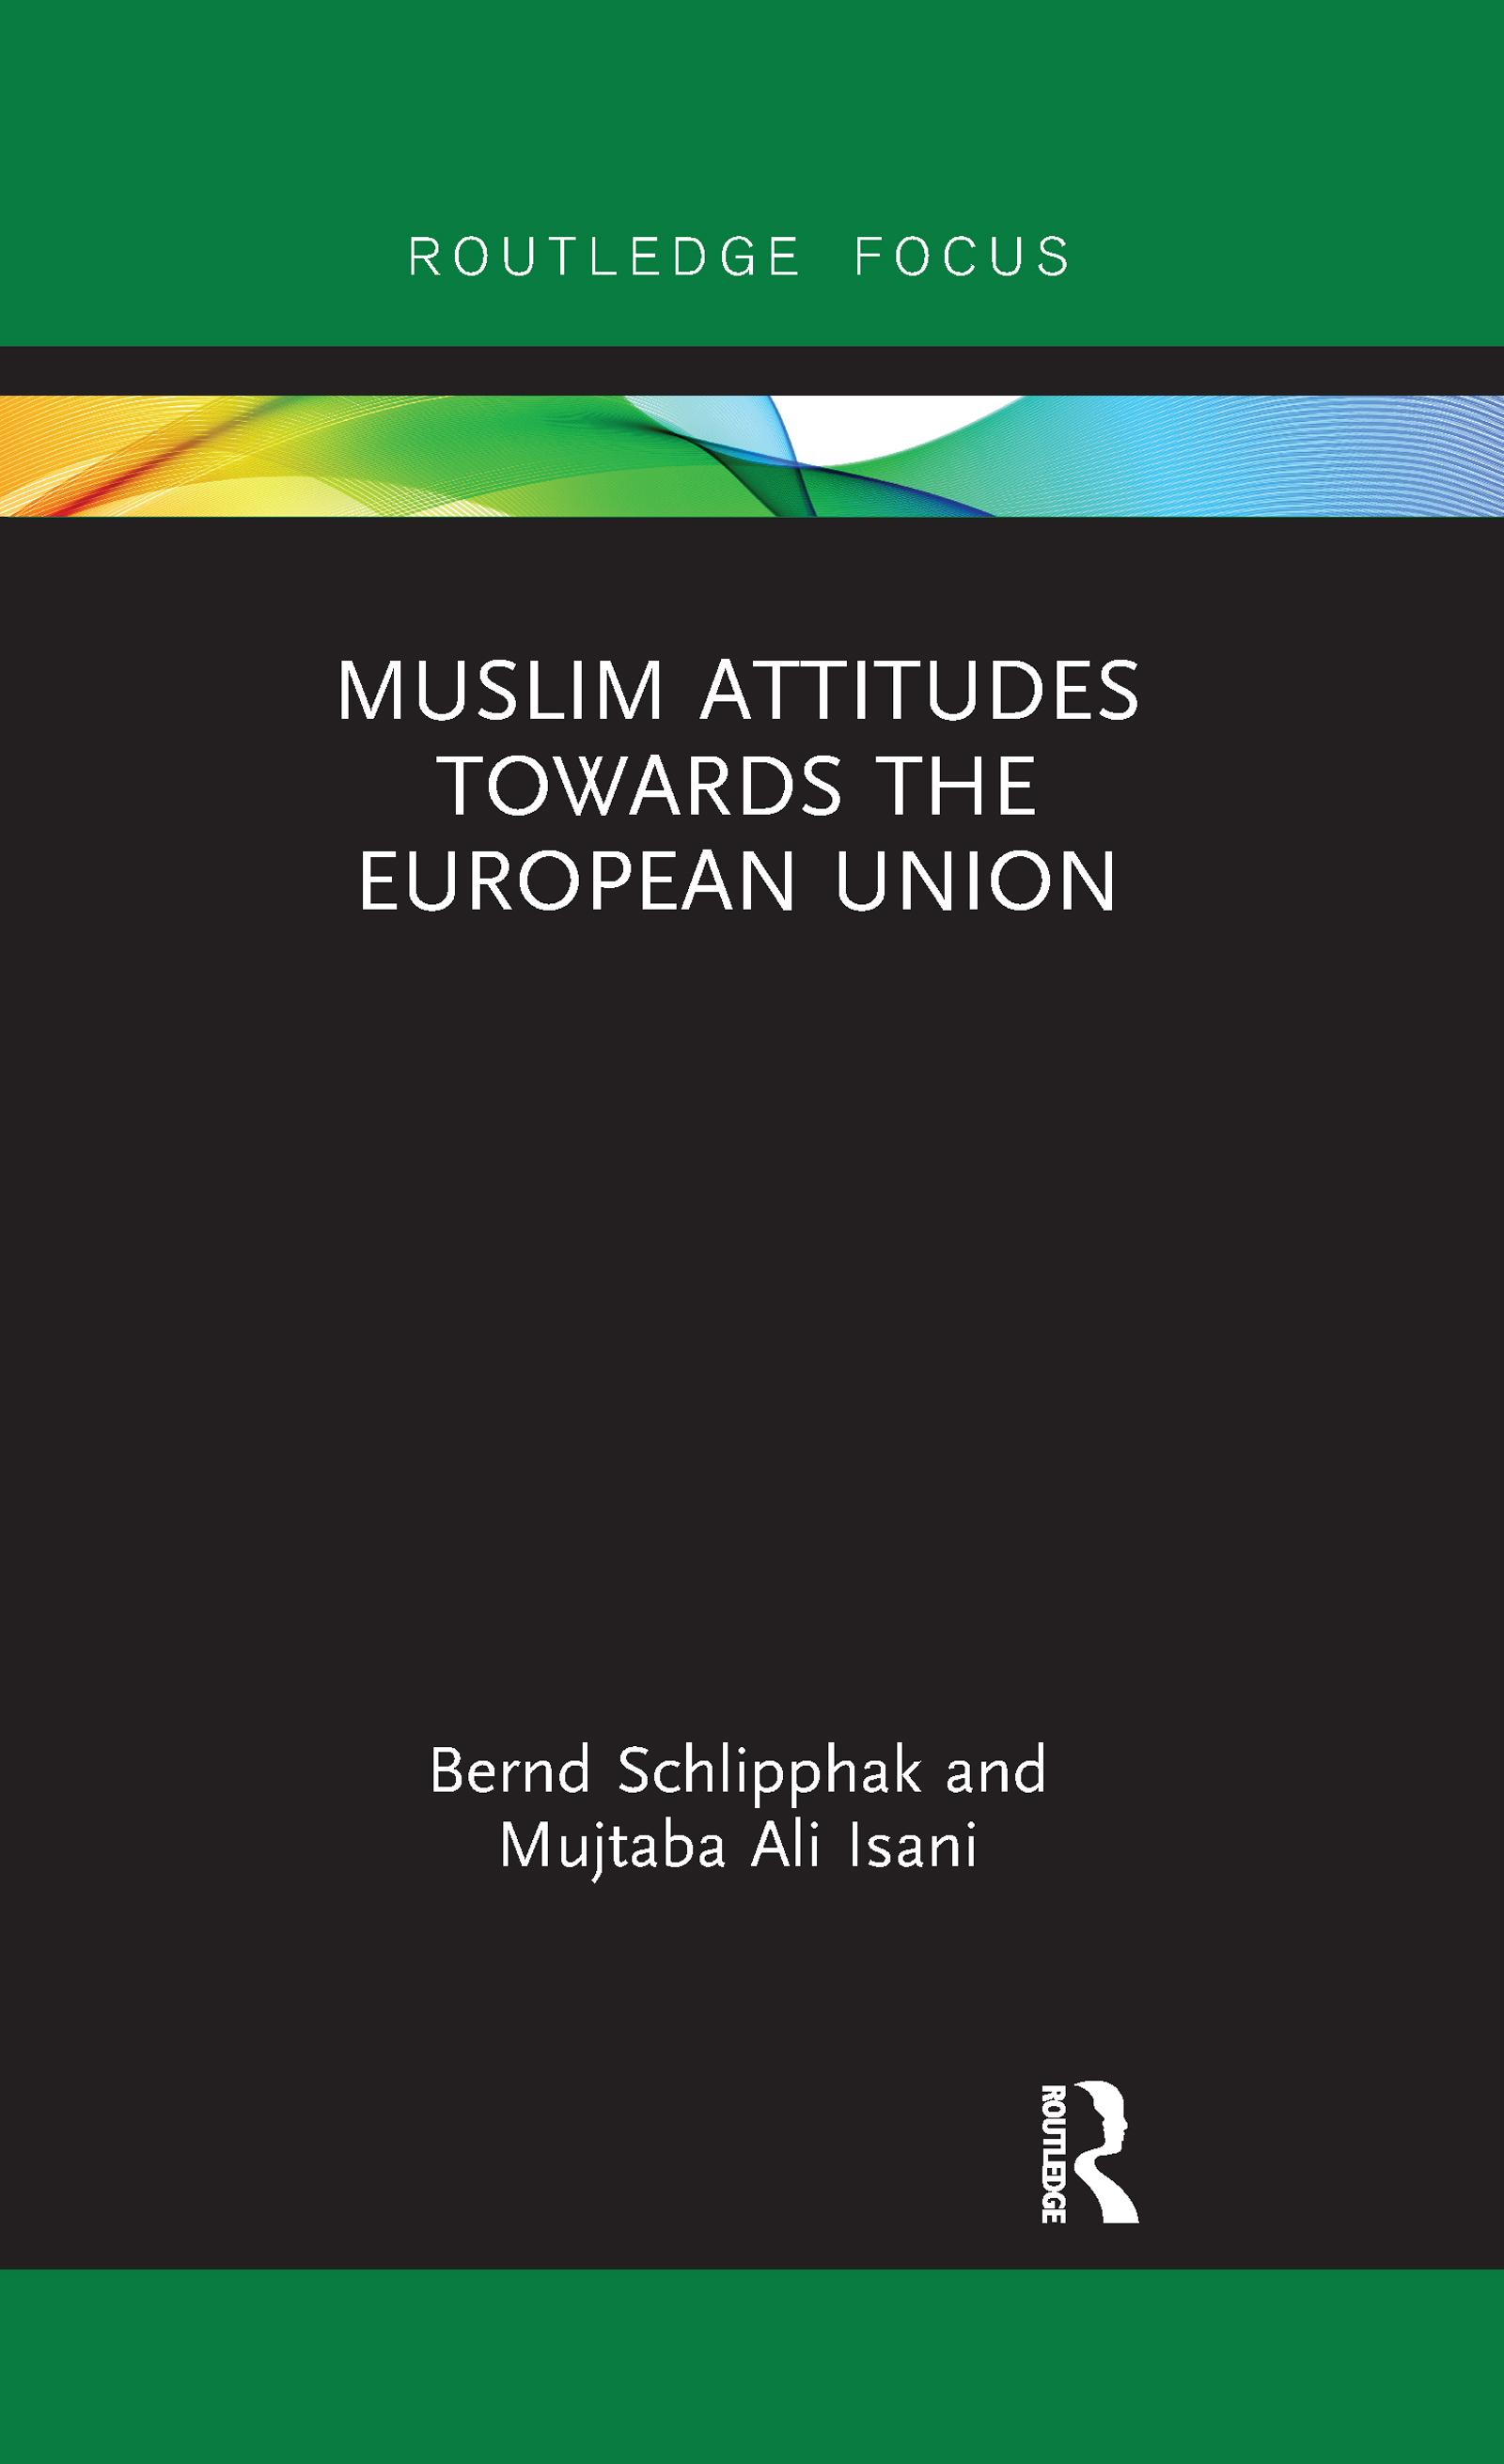 Muslim Attitudes Towards the European Union